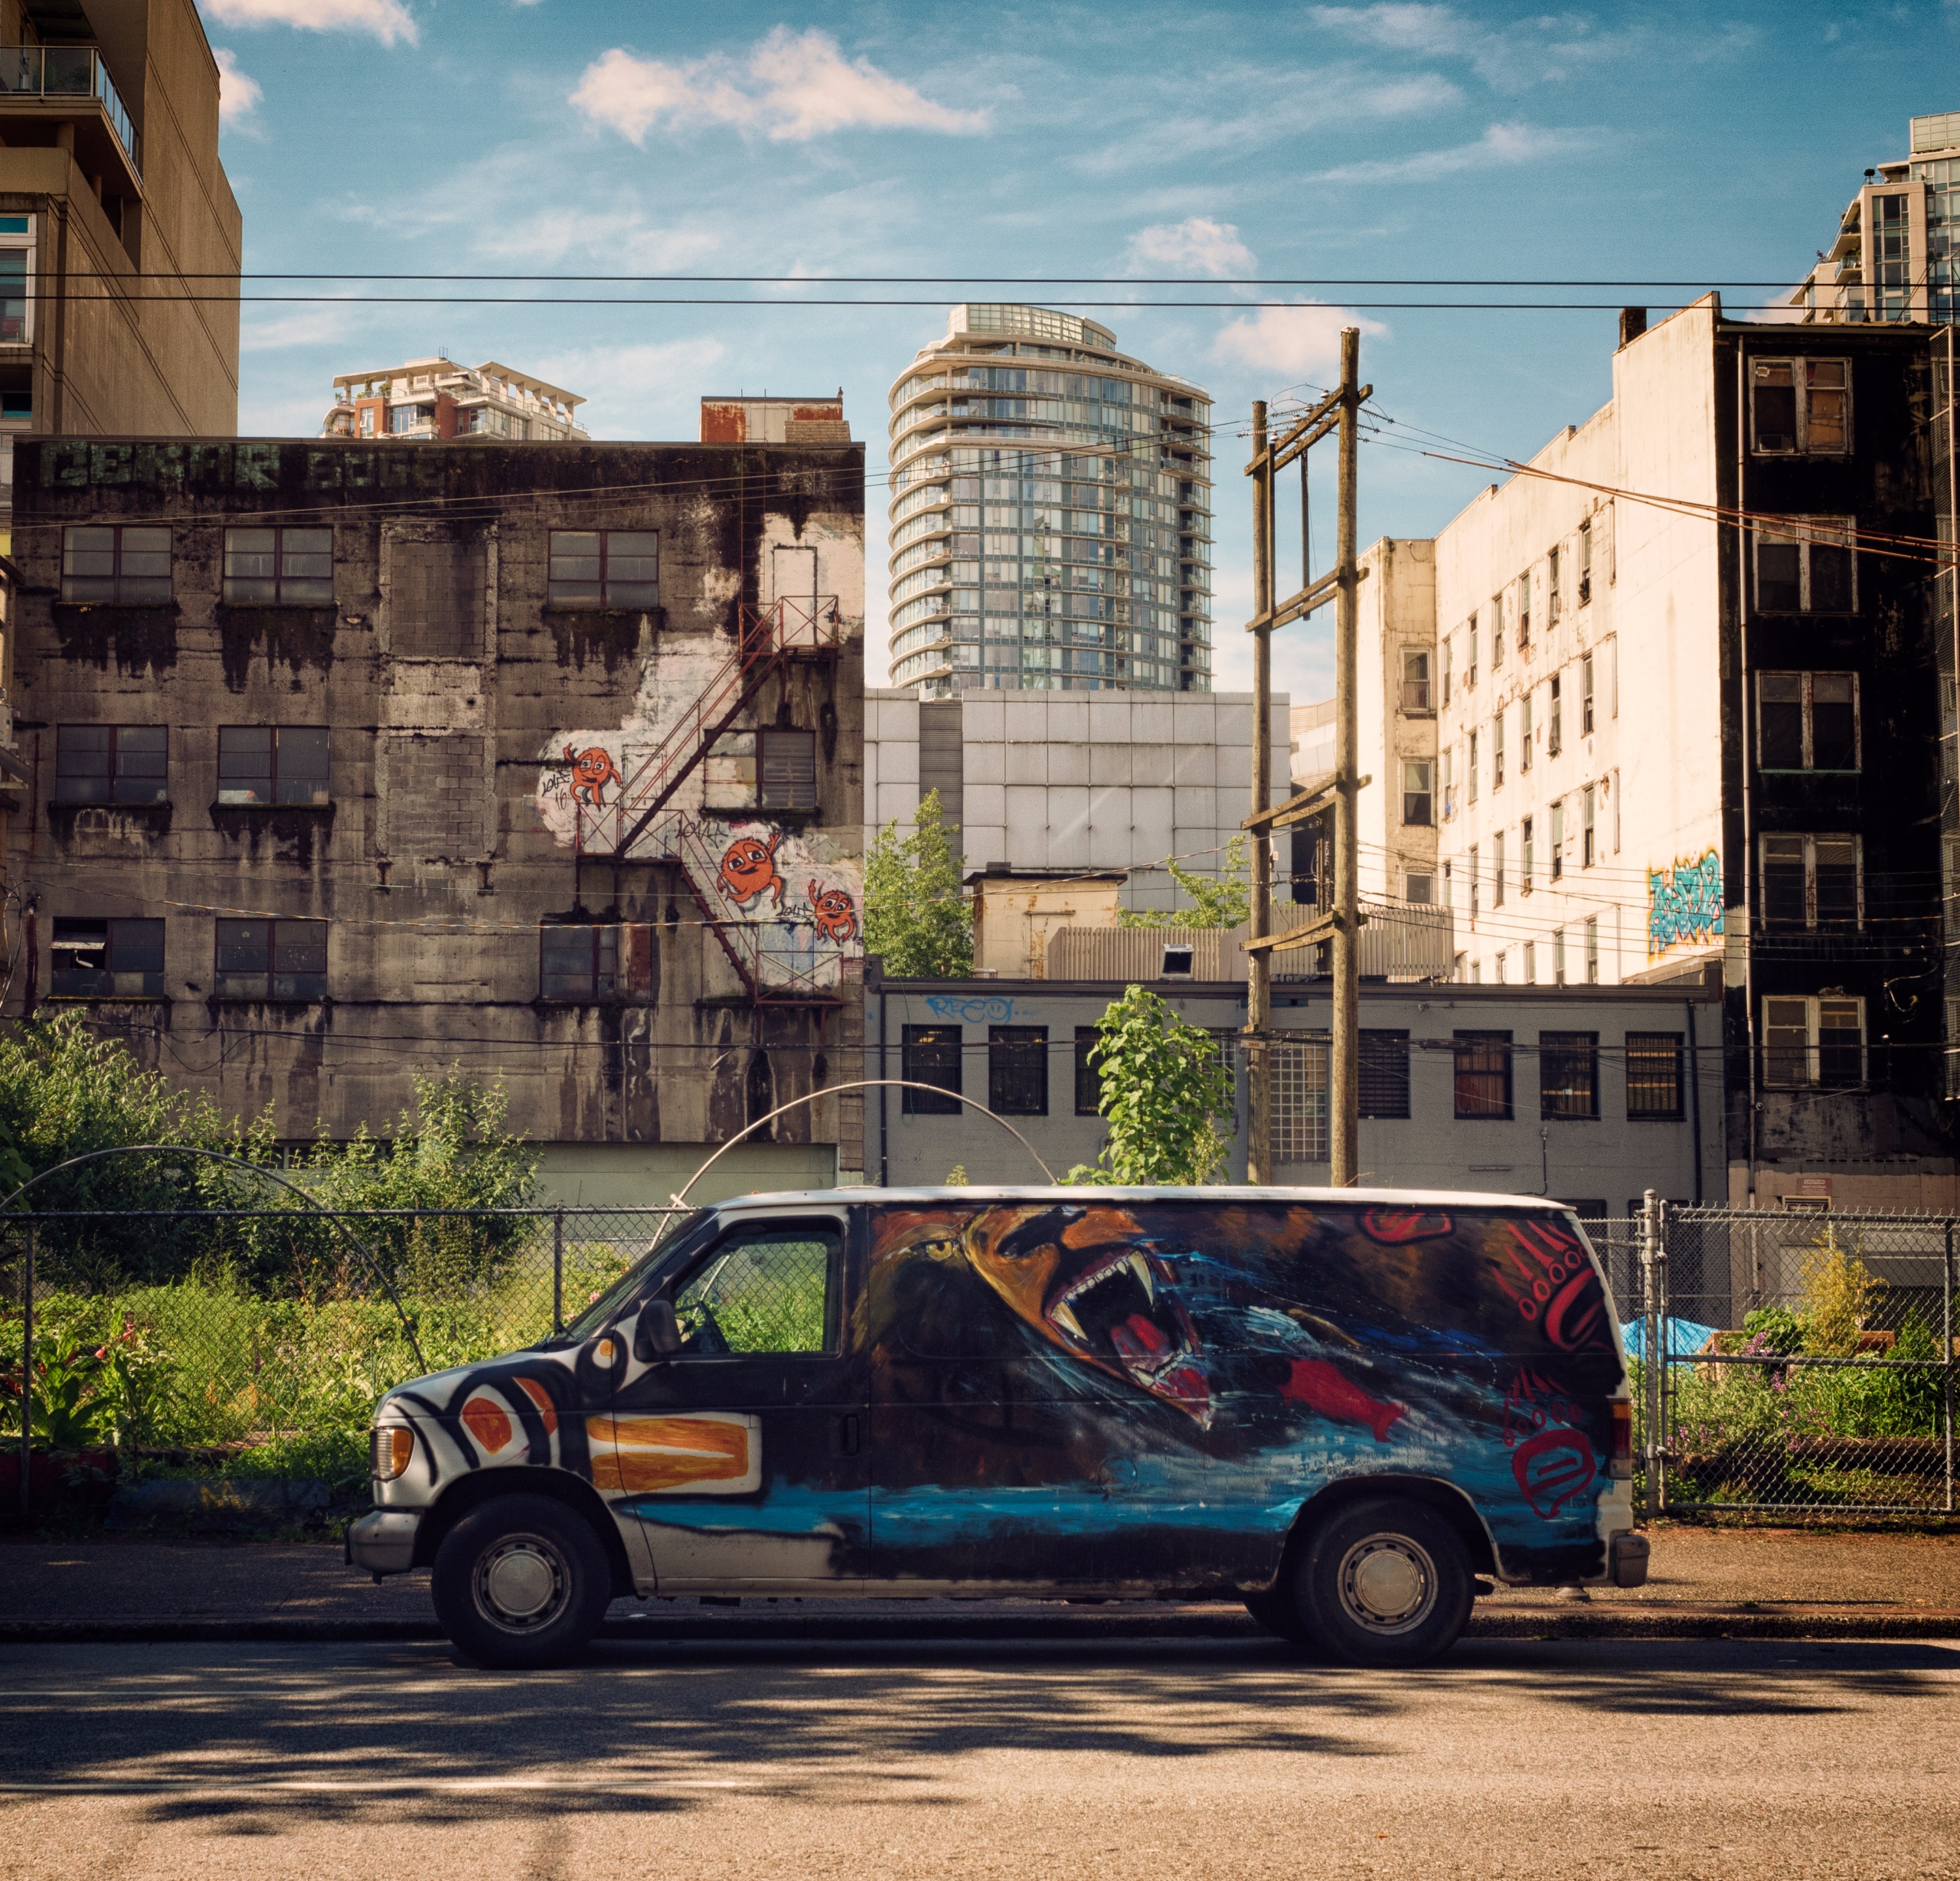 Place - Vancouver, Canada Olymp - juangonzalez   ello